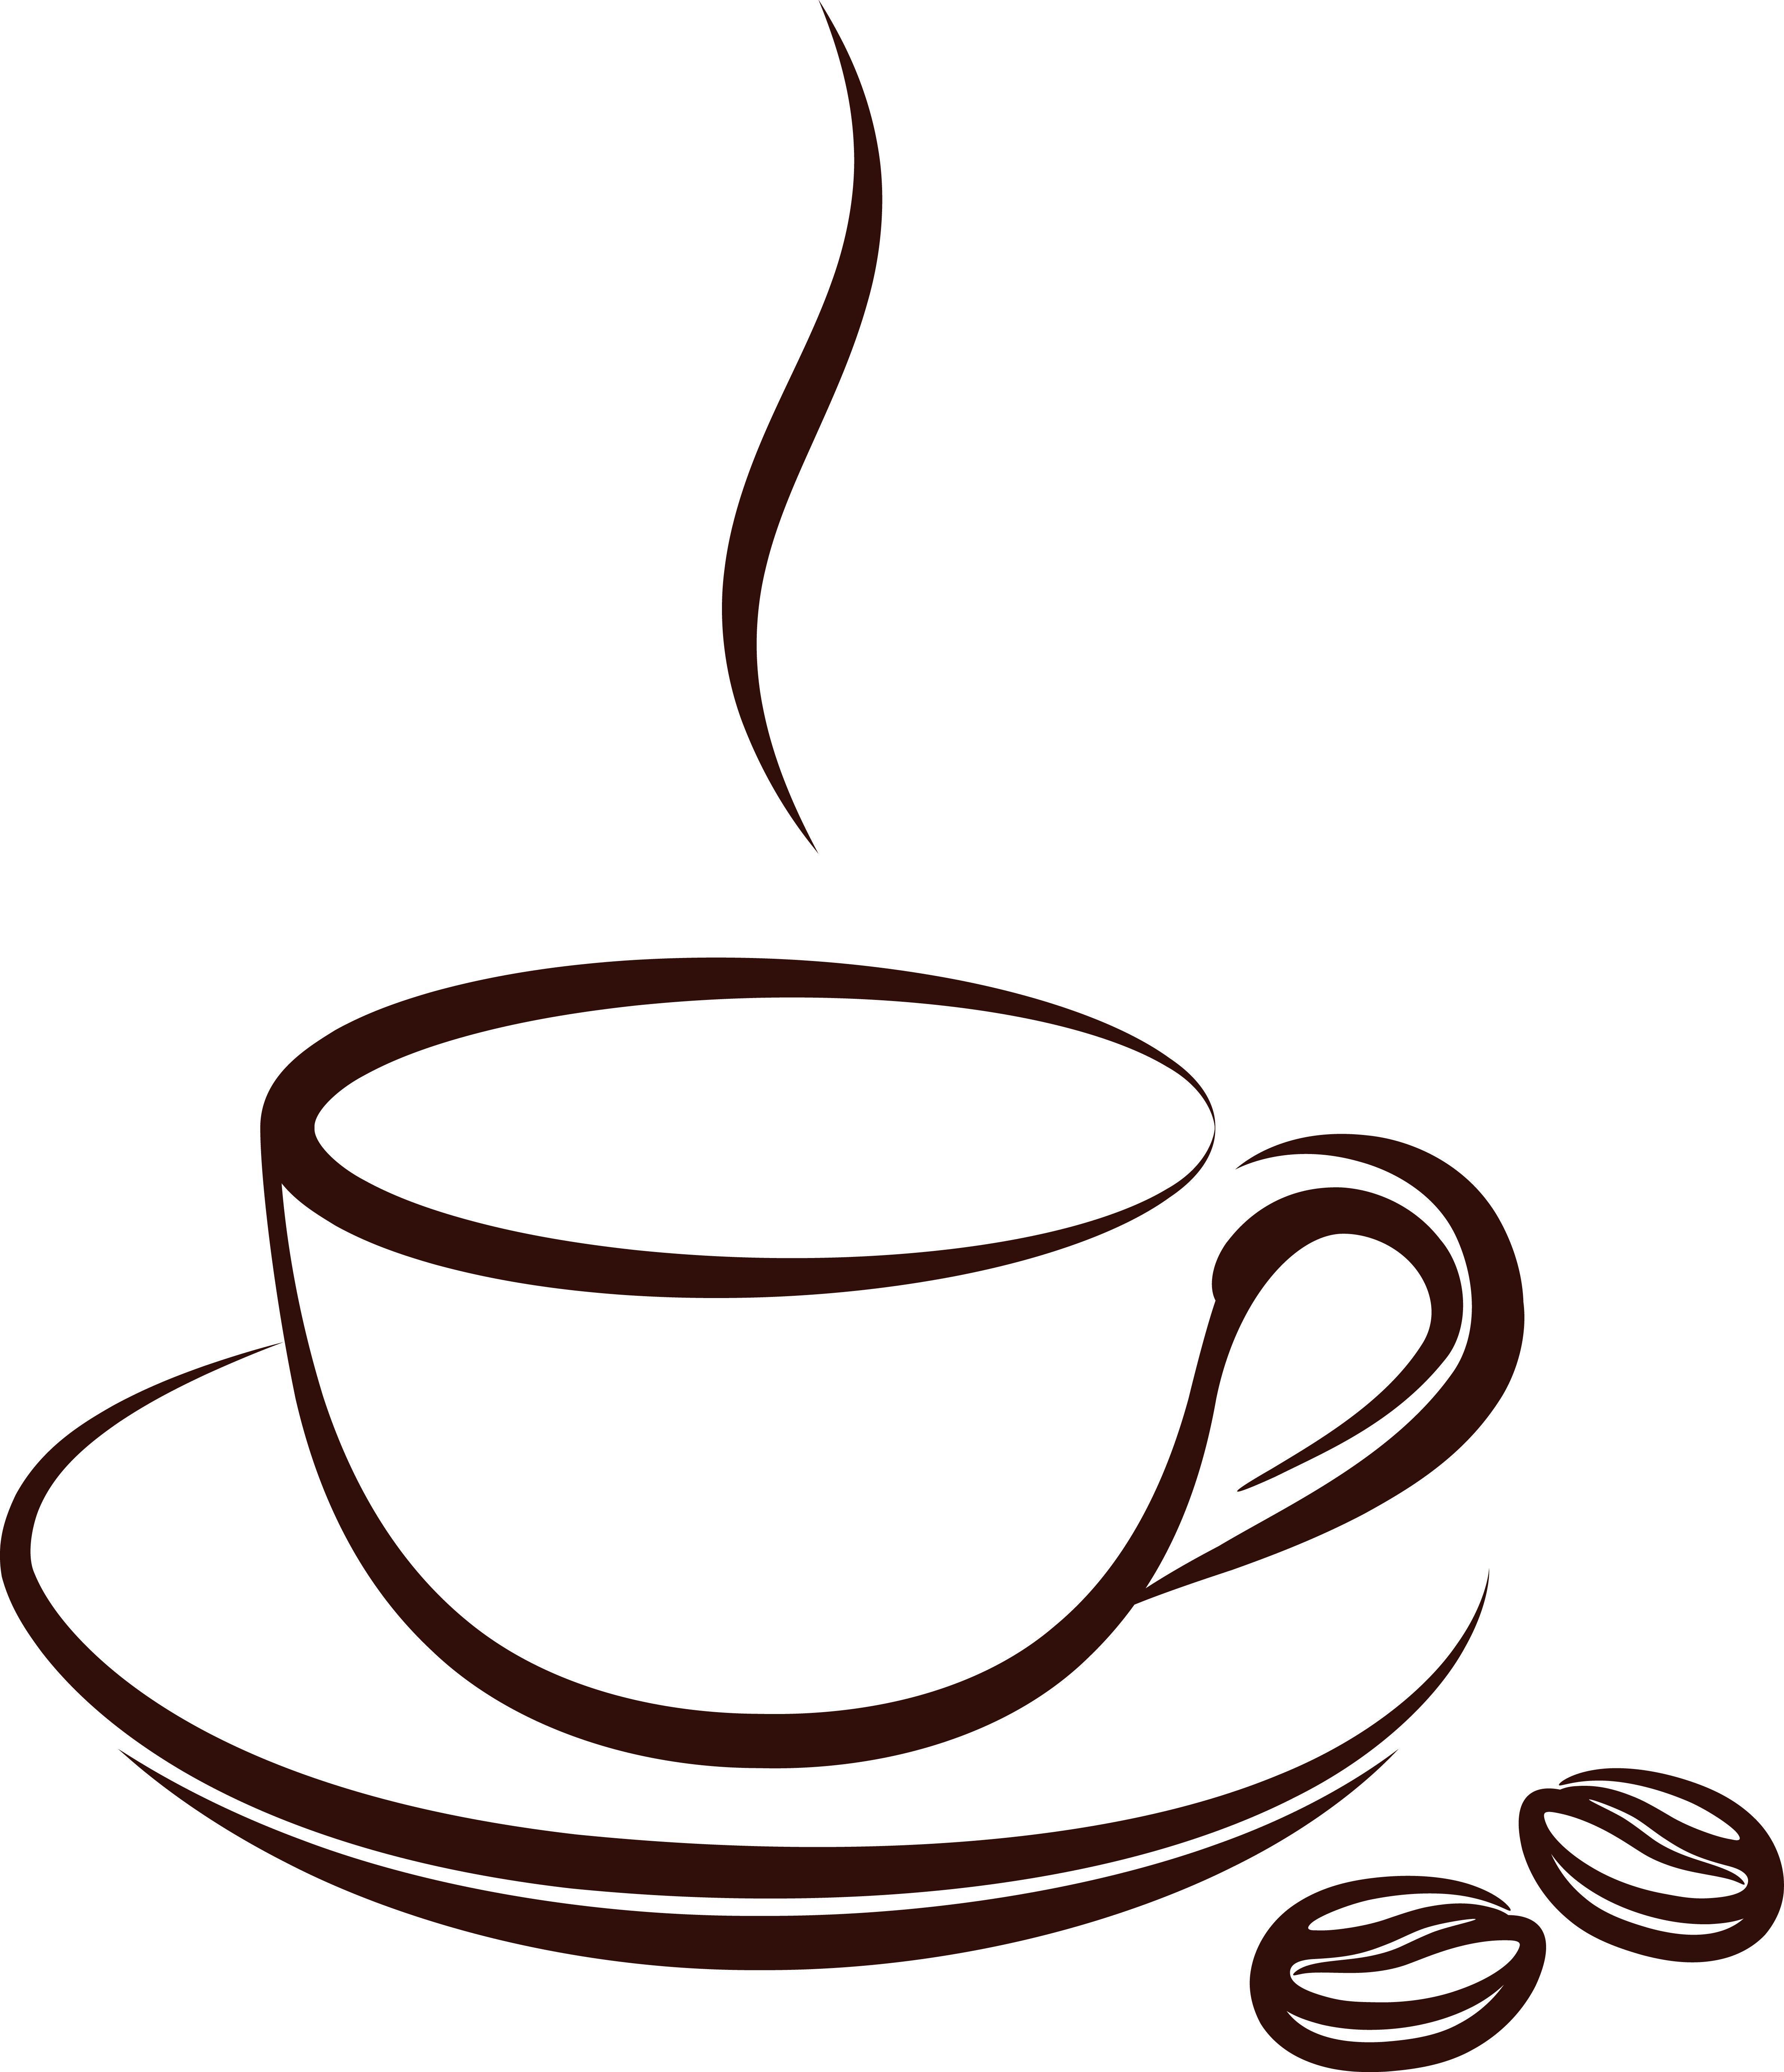 Clipart kaffee 4 » Clipart Portal.